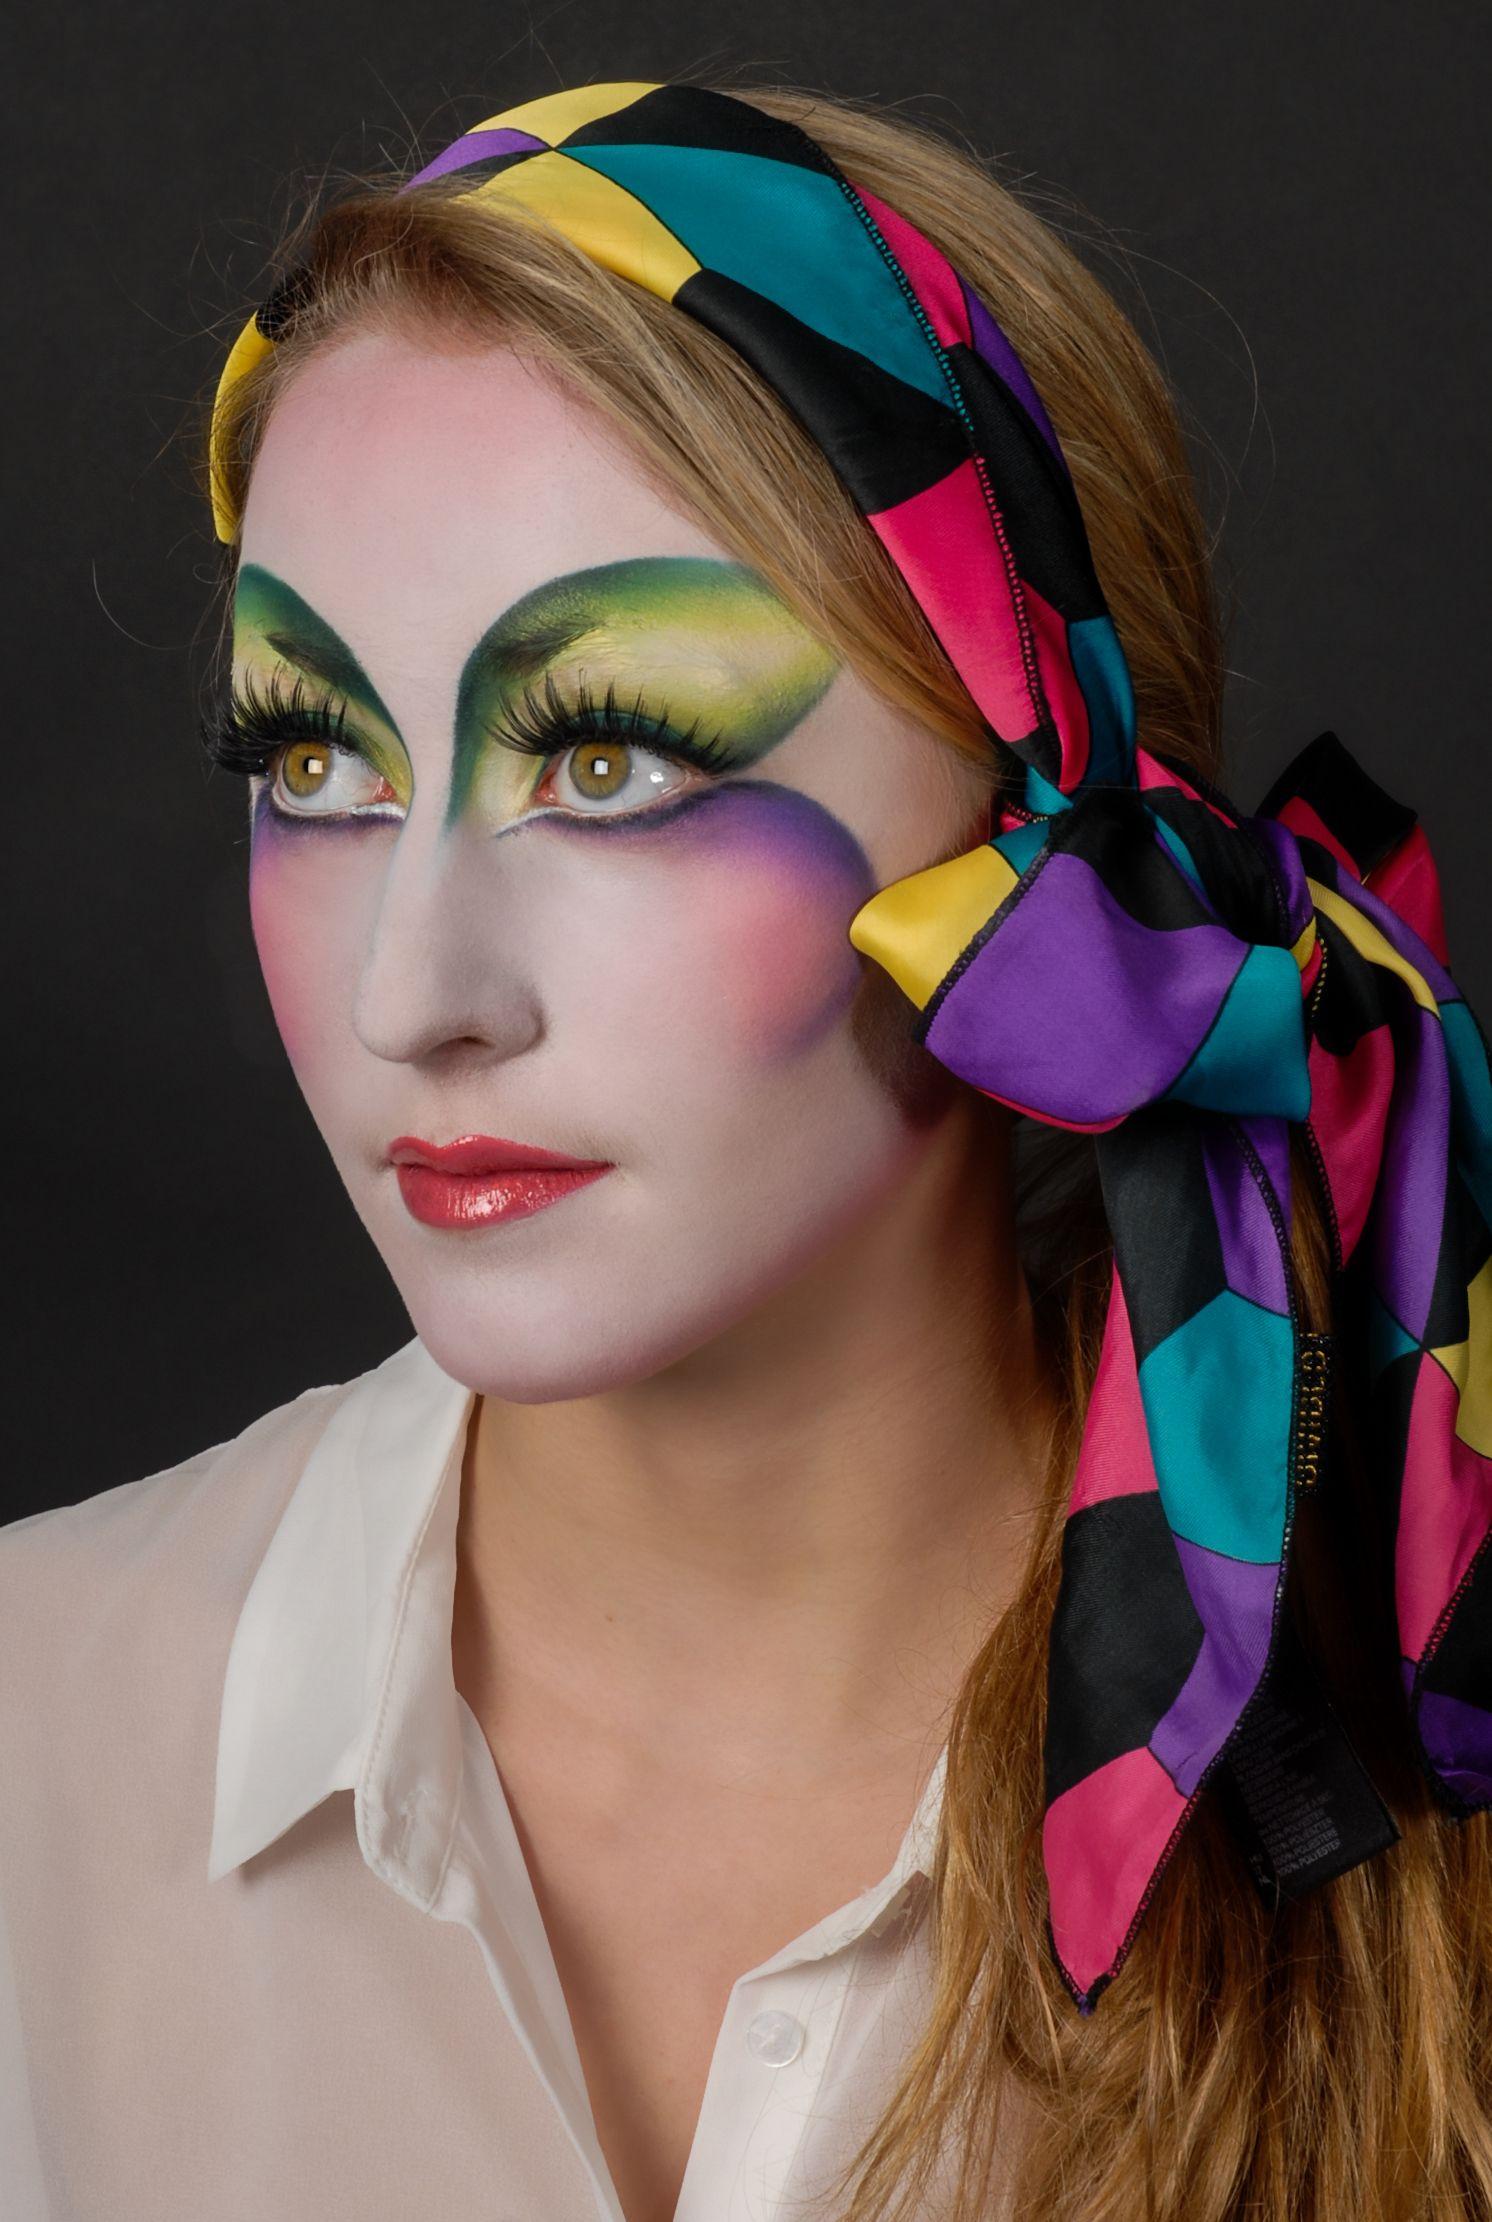 cirque du soleil makeup